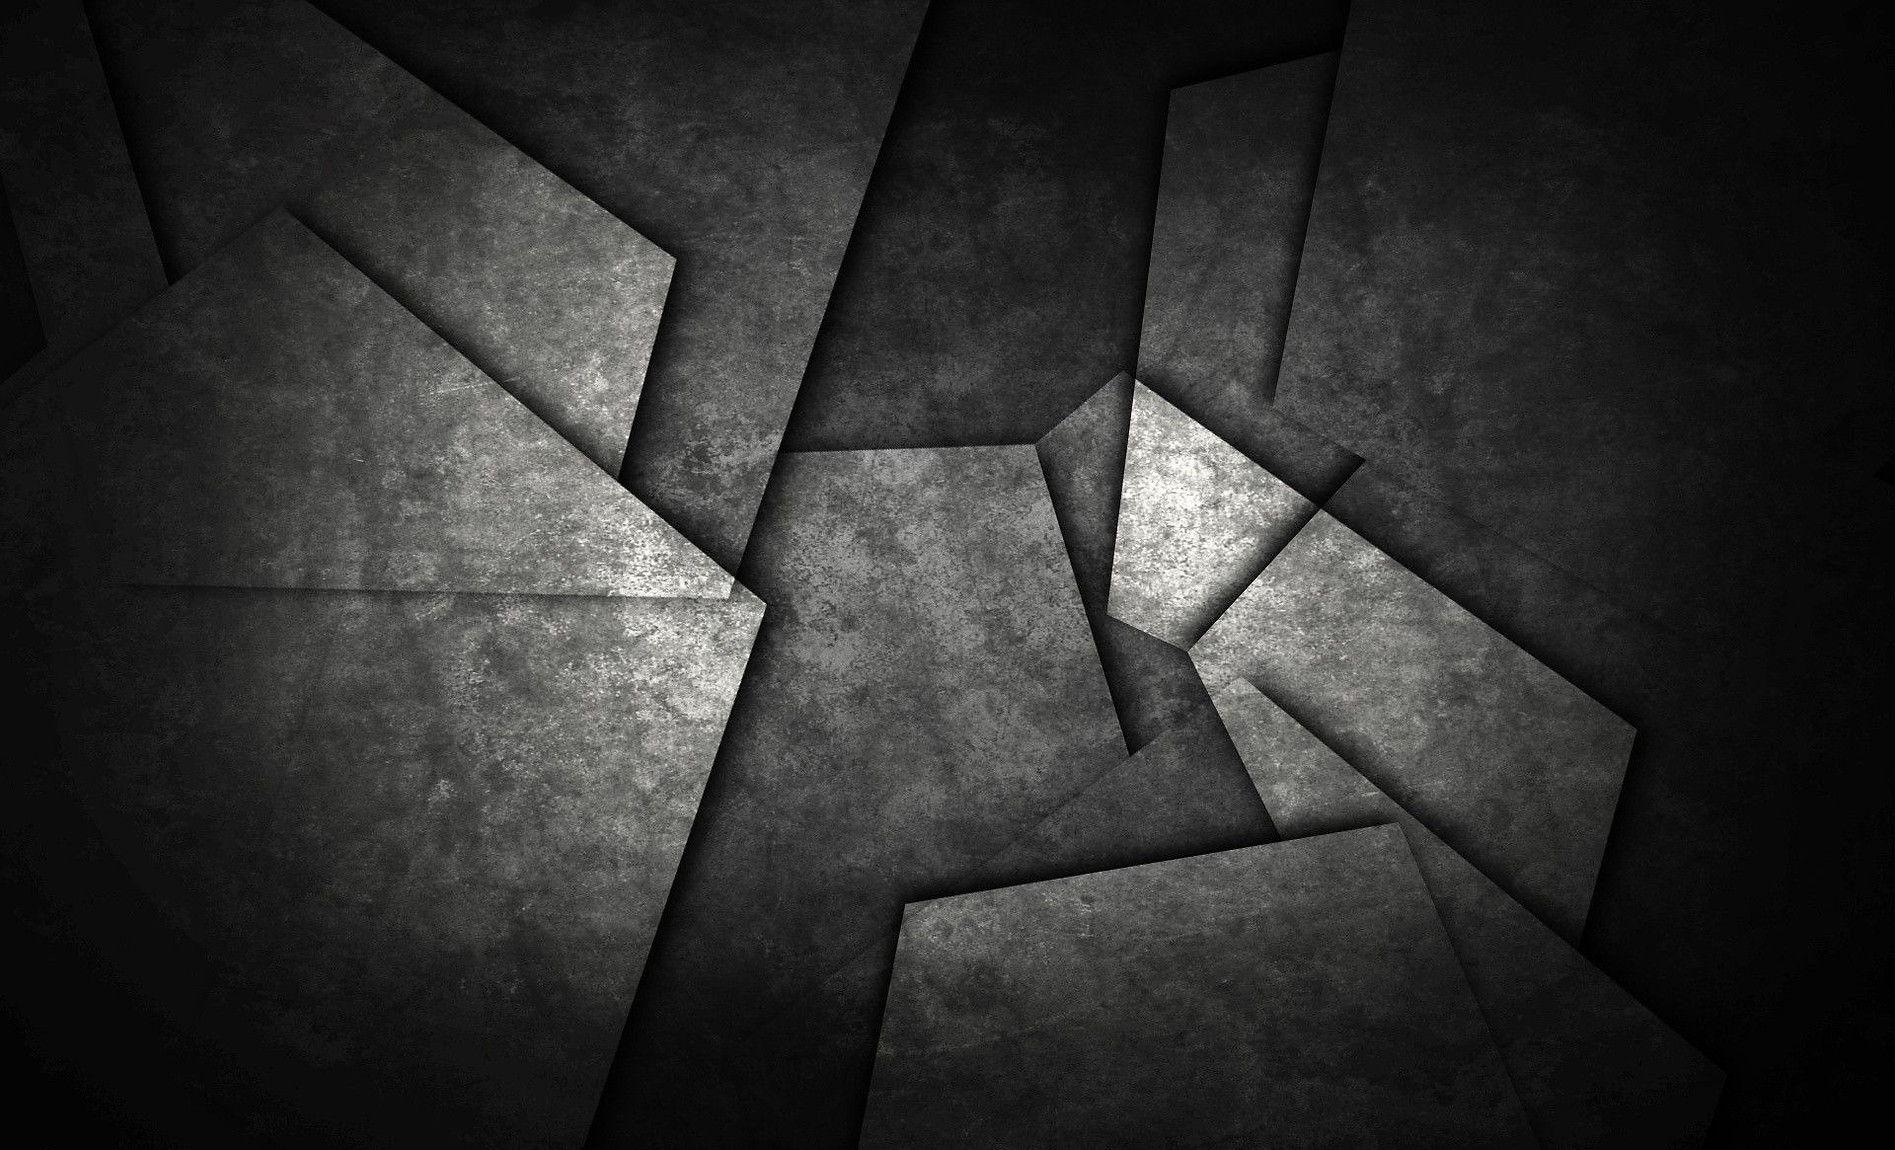 wallpaper_black_texture_001_edited.jpg